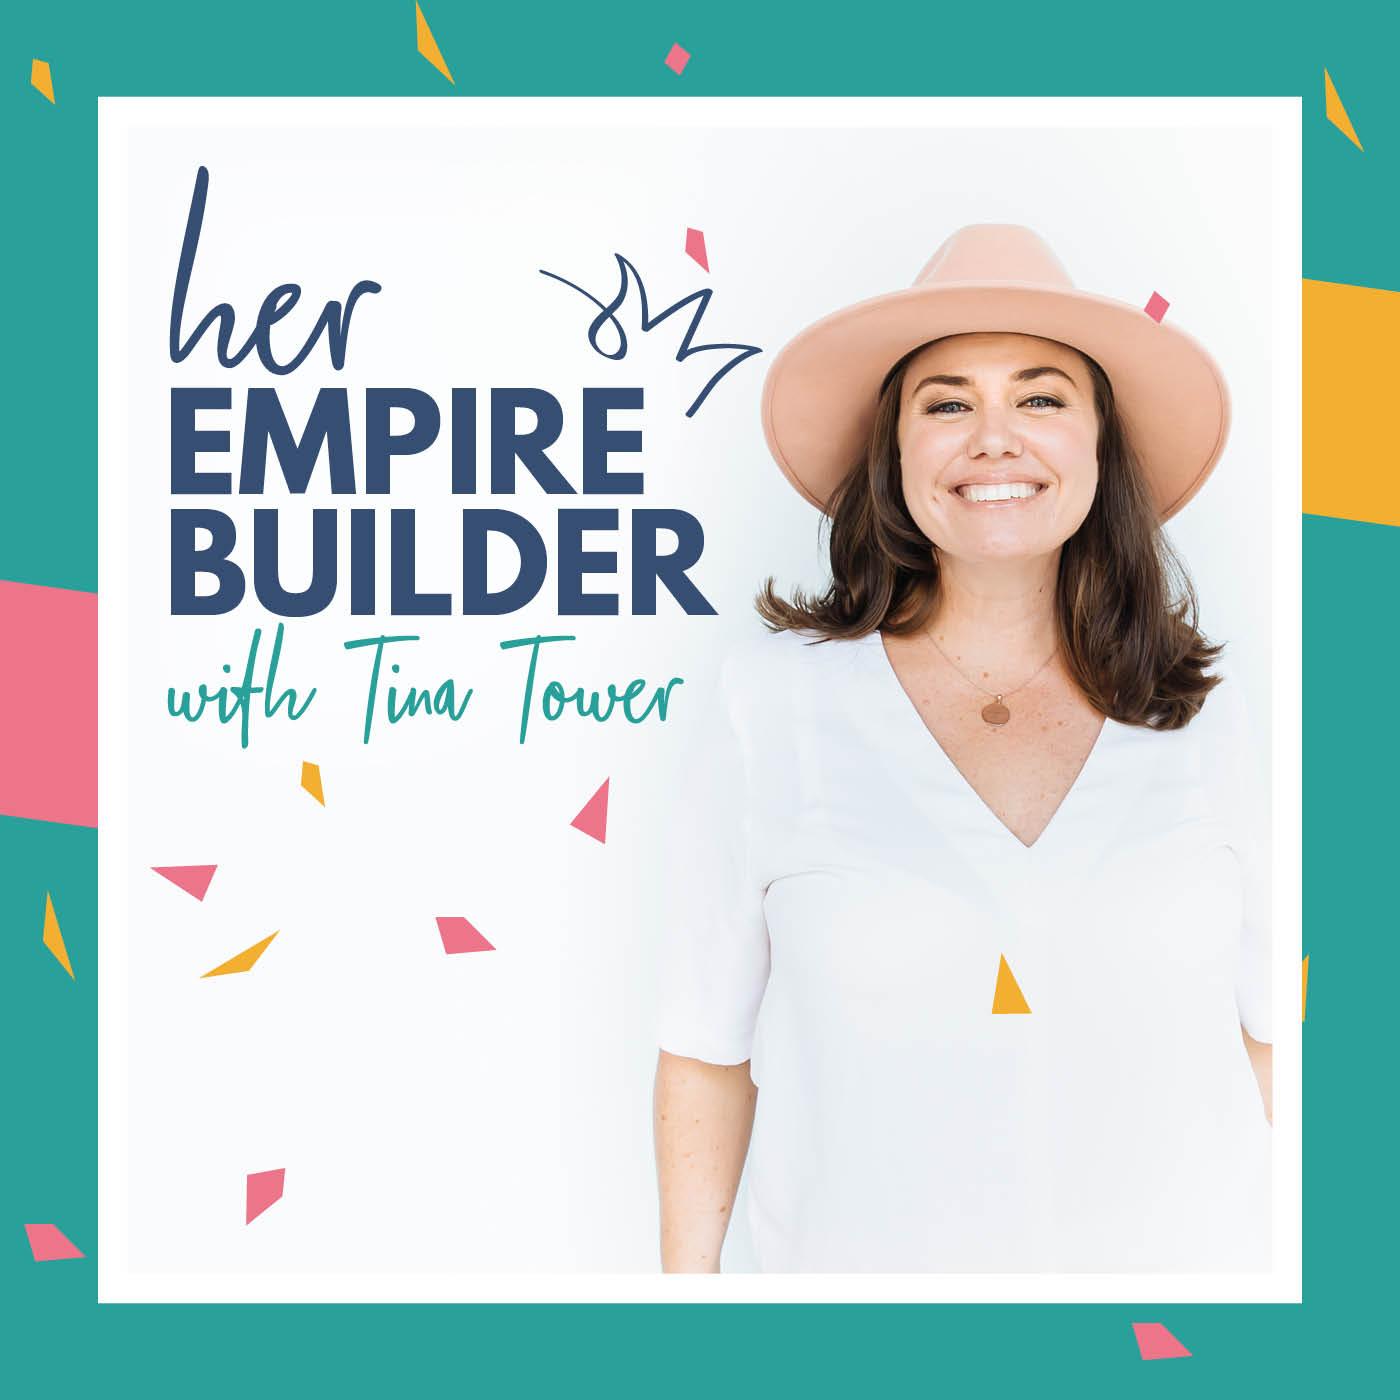 Her Empire Builder show art